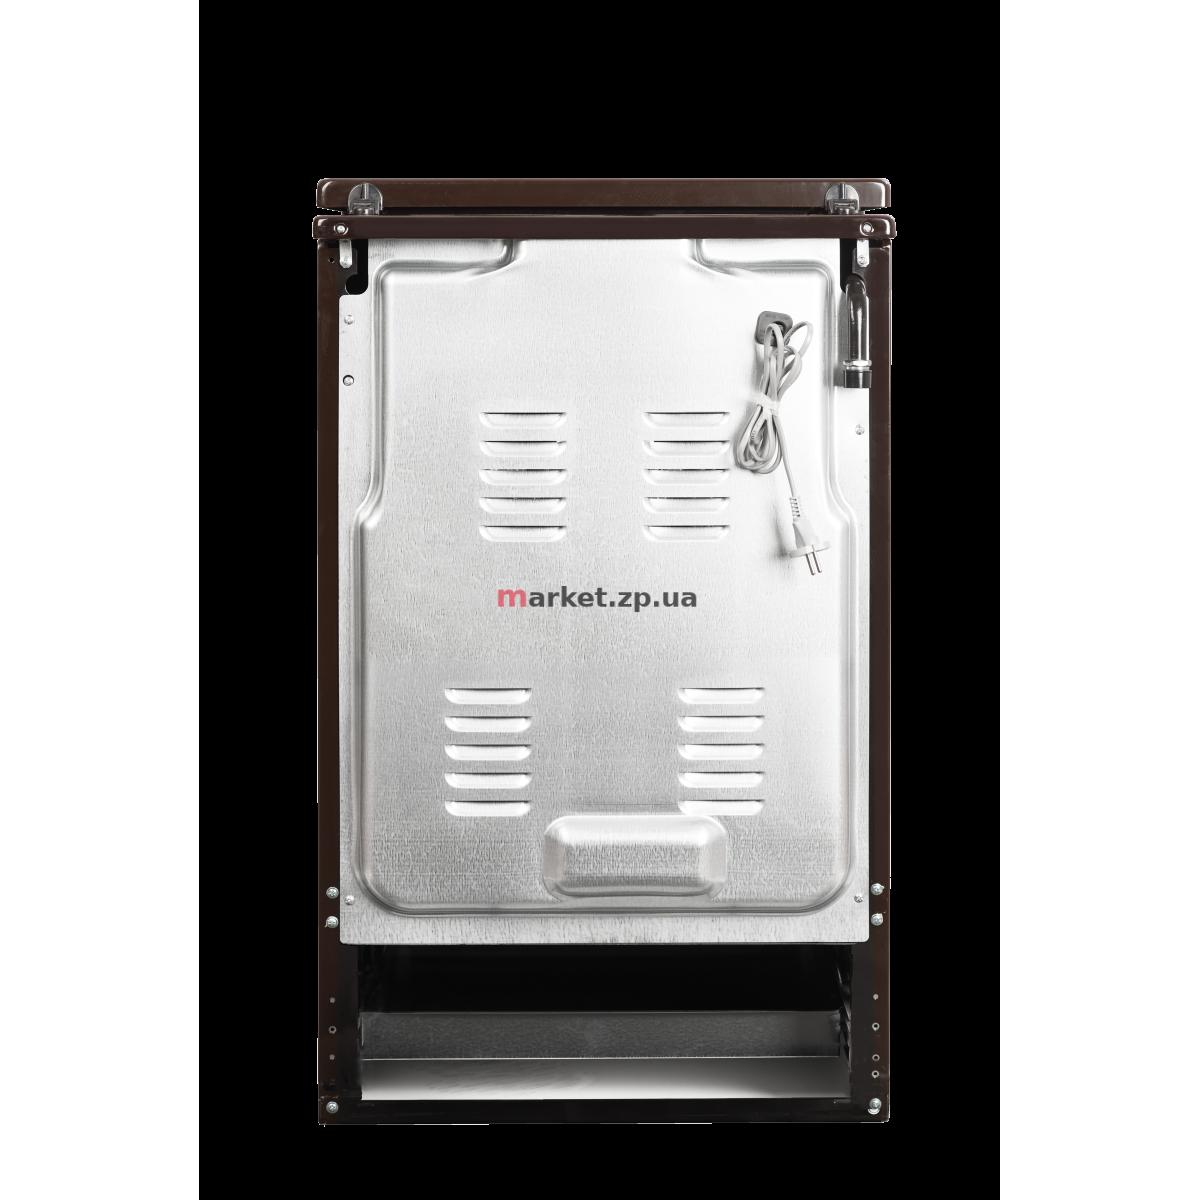 Плита газовая GRETA 1470-06 aa (B) Газ-контроль